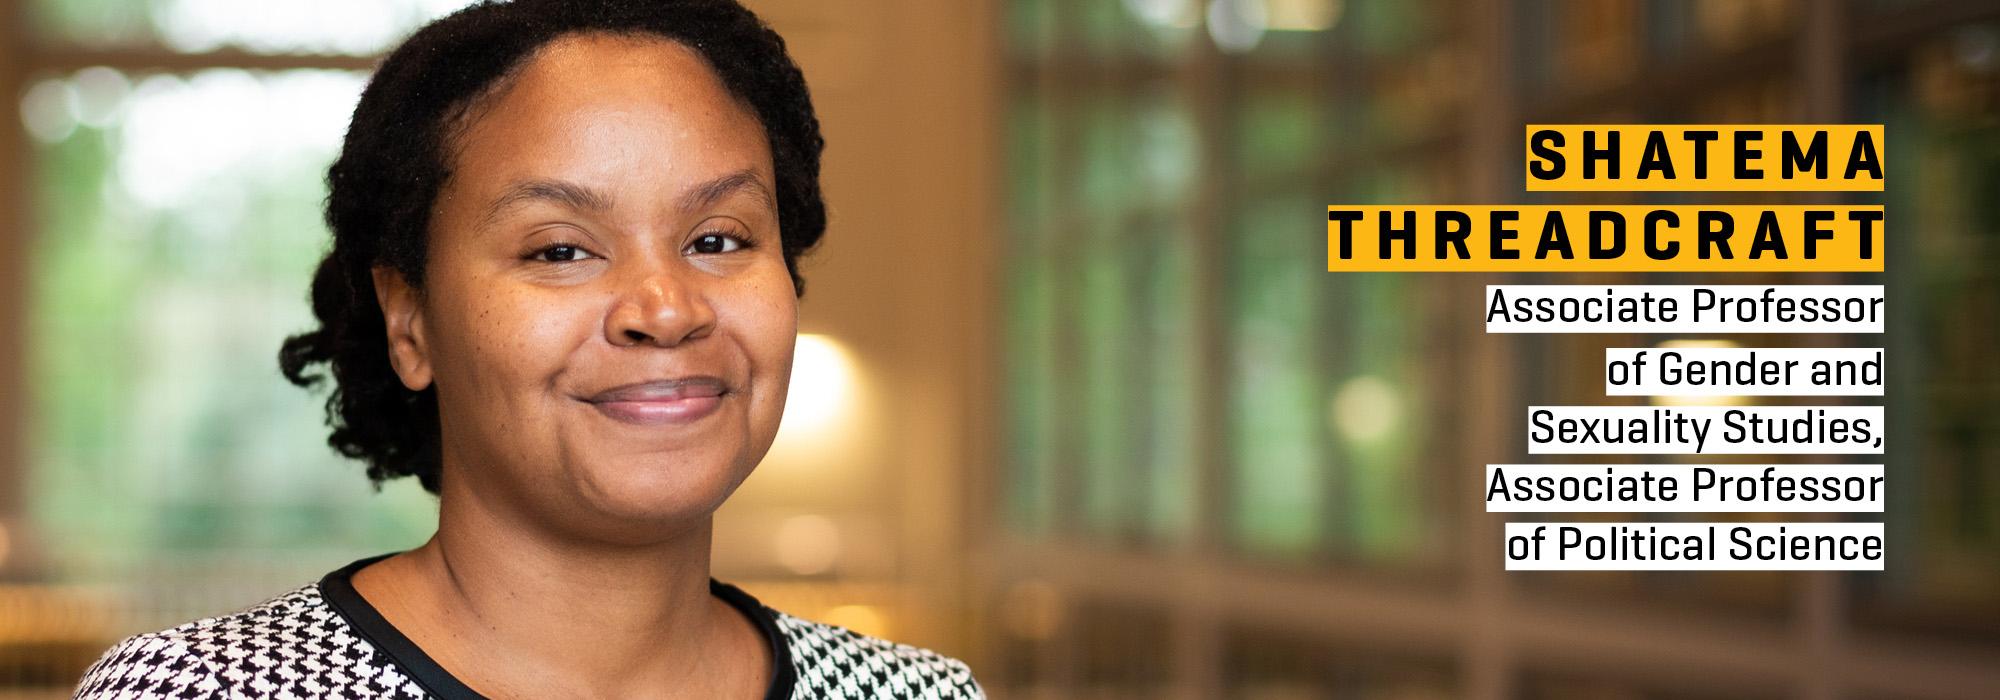 New faculty Shatema Threadcraft: Political bodies